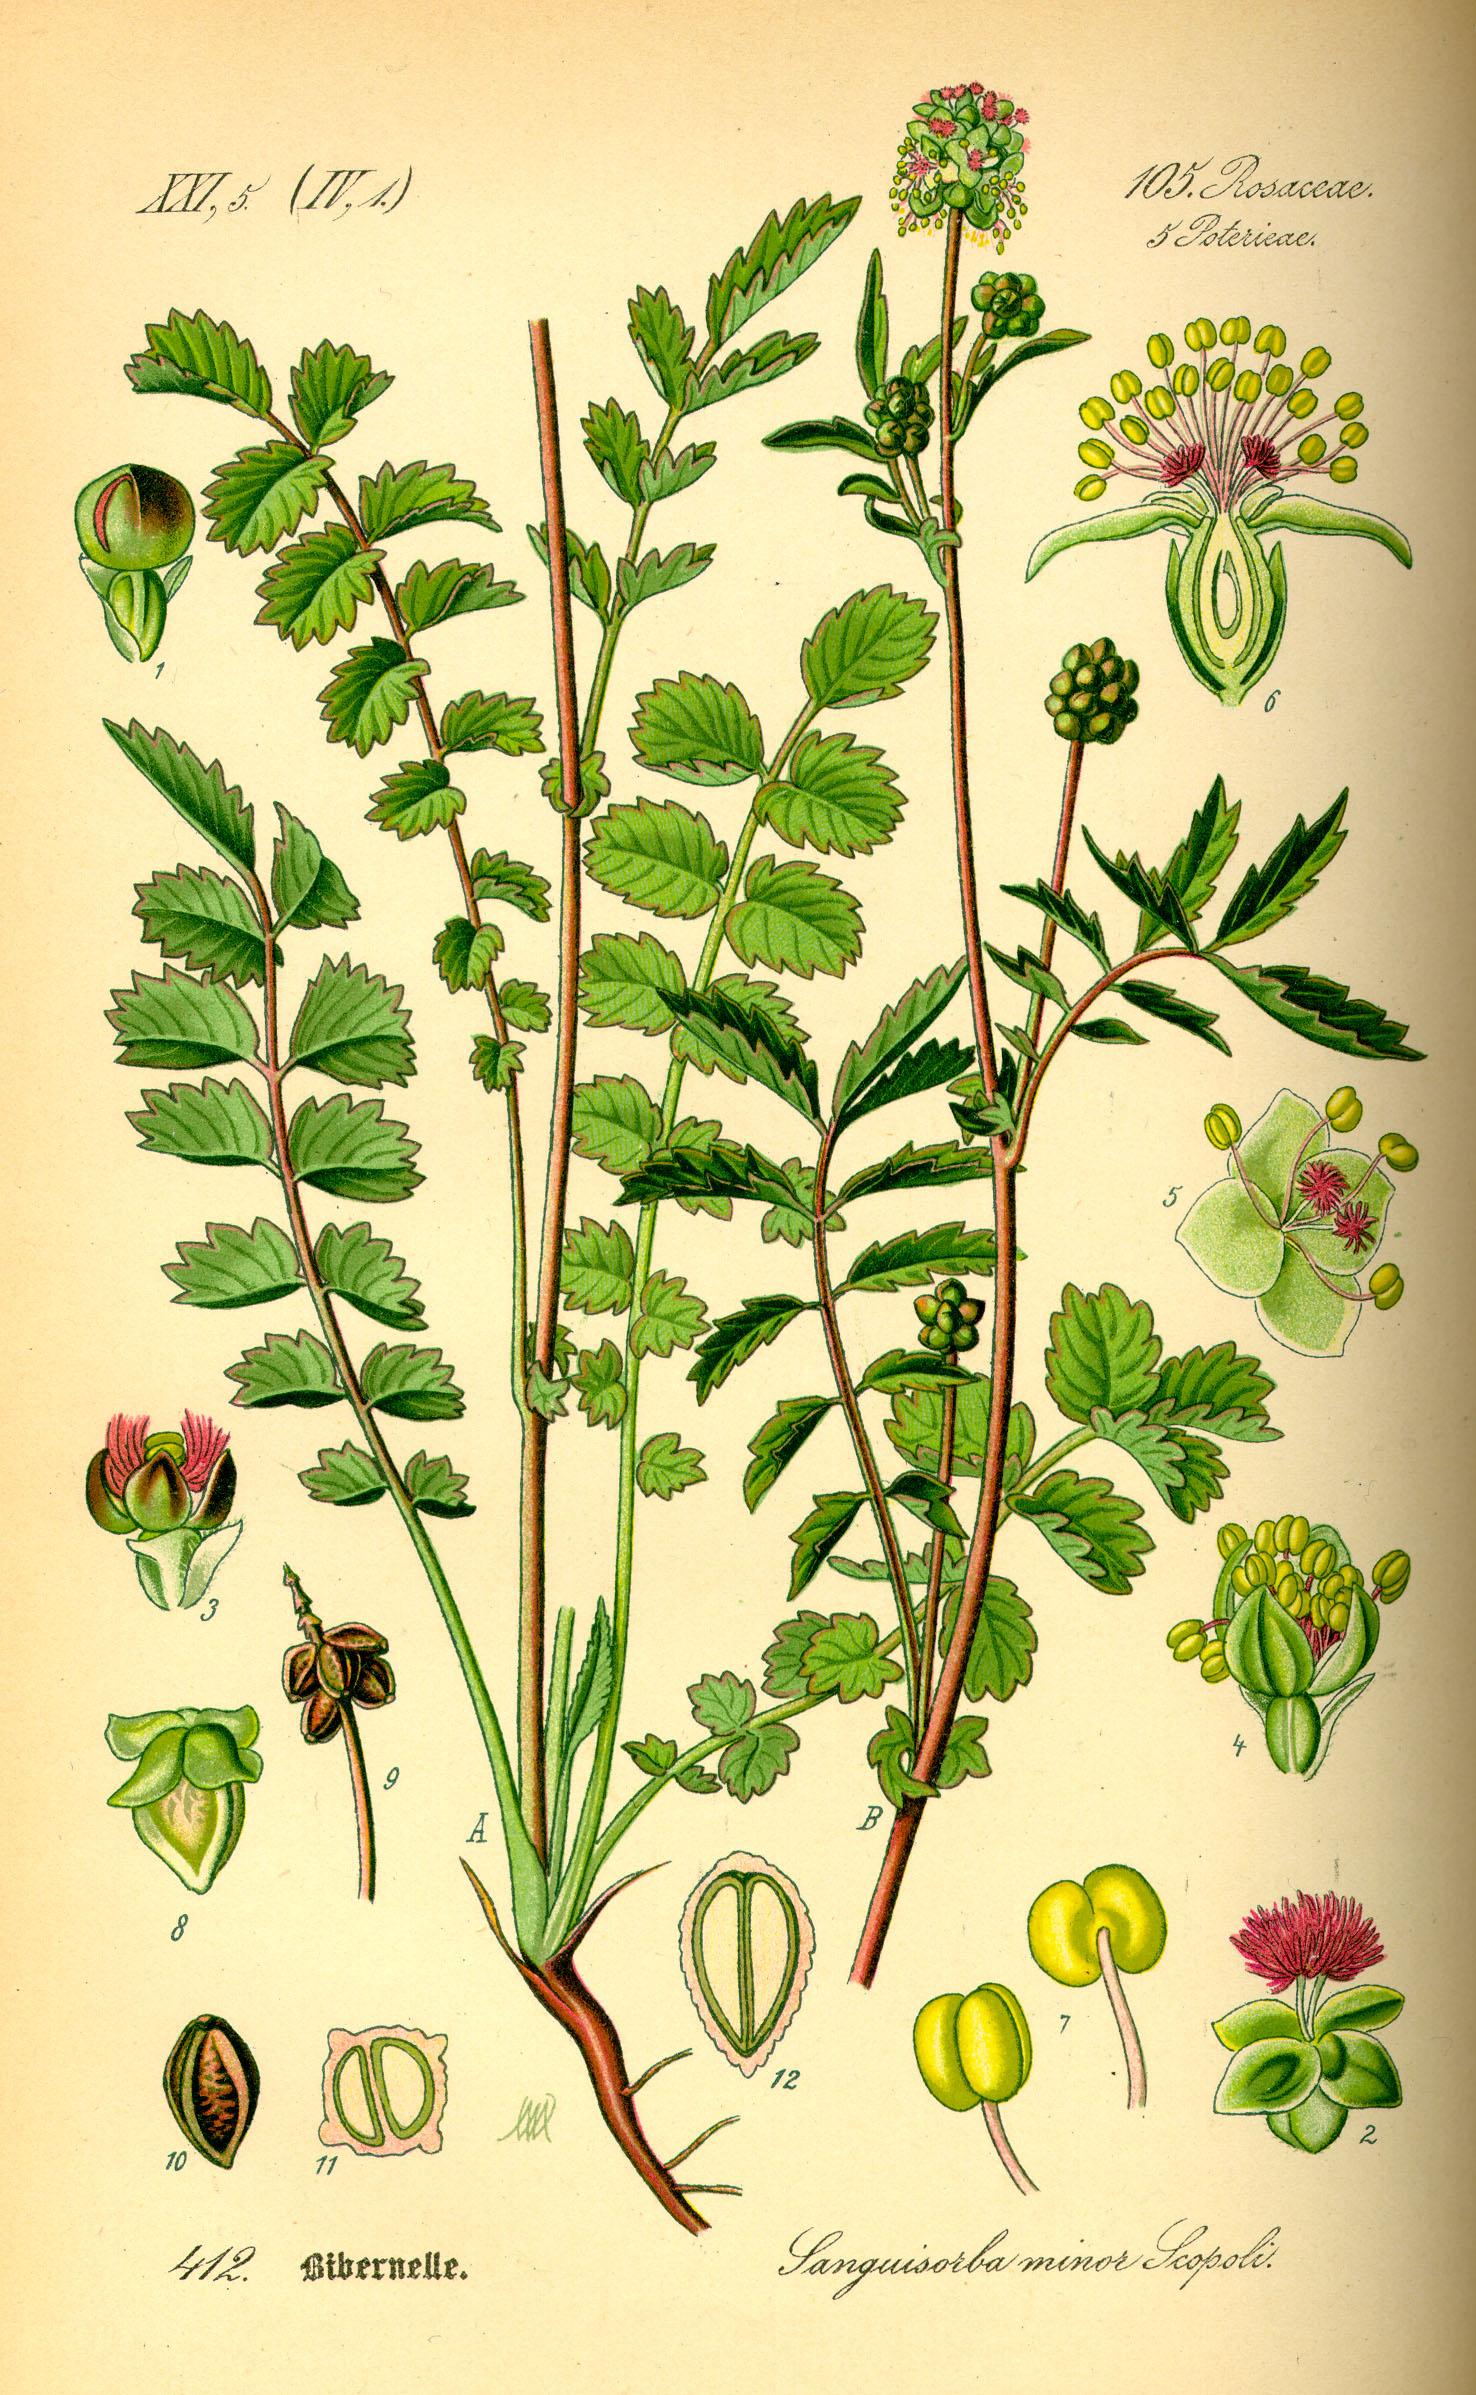 File:Illustration Sanguisorba minor0.jpg - Wikimedia Commons